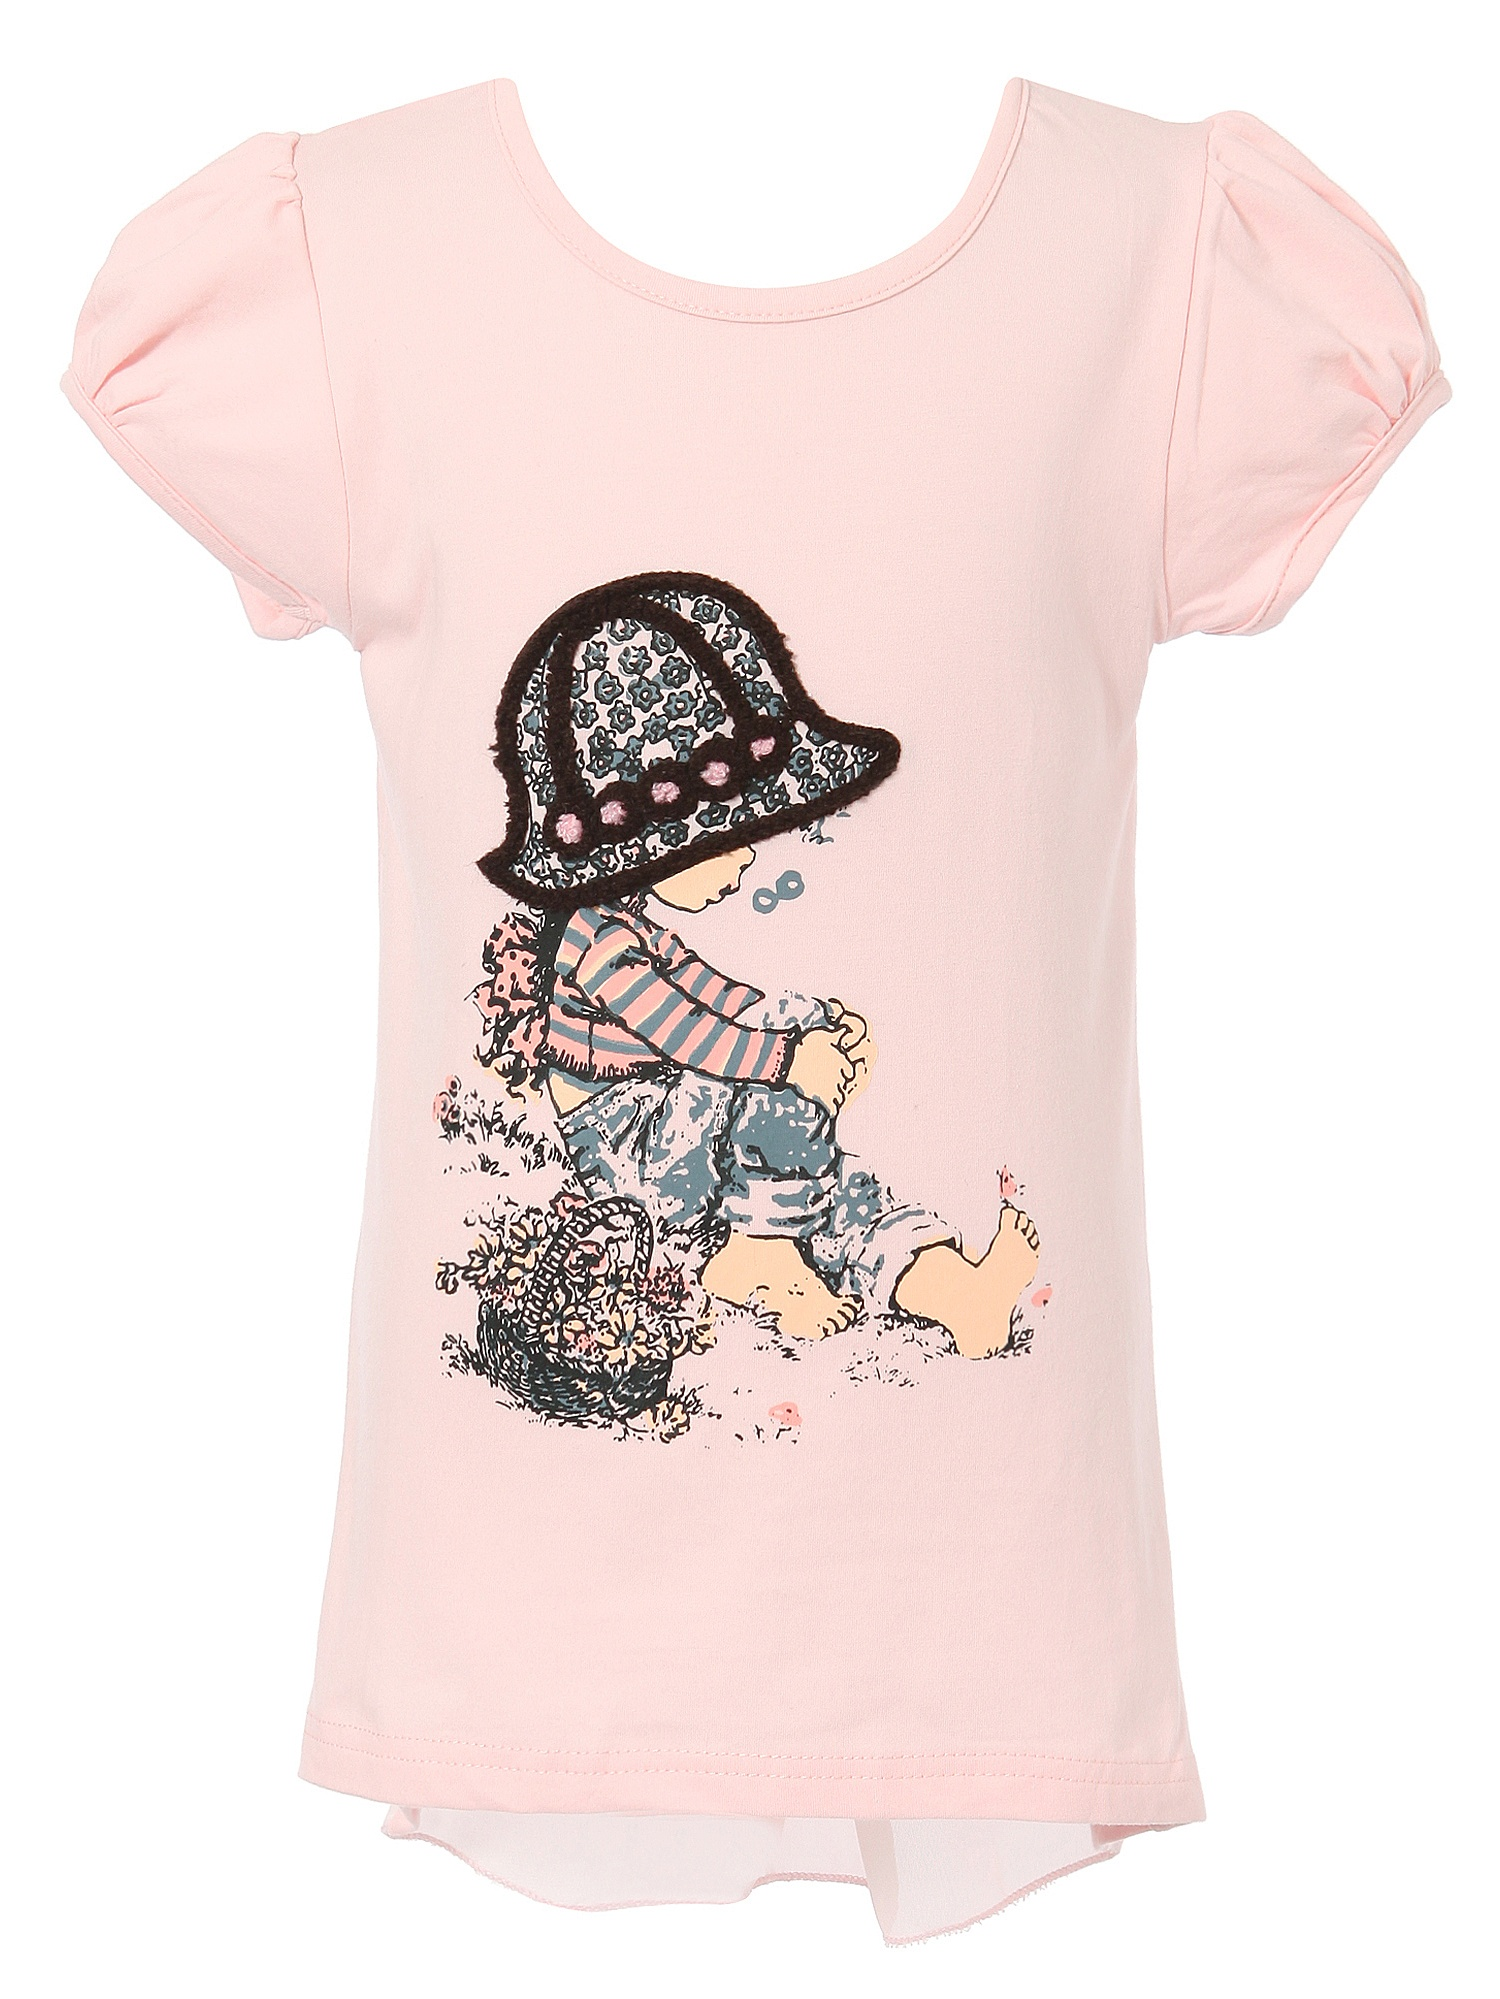 Richie House Girls' Short Sleeve T-Shirt with Girl RH1888